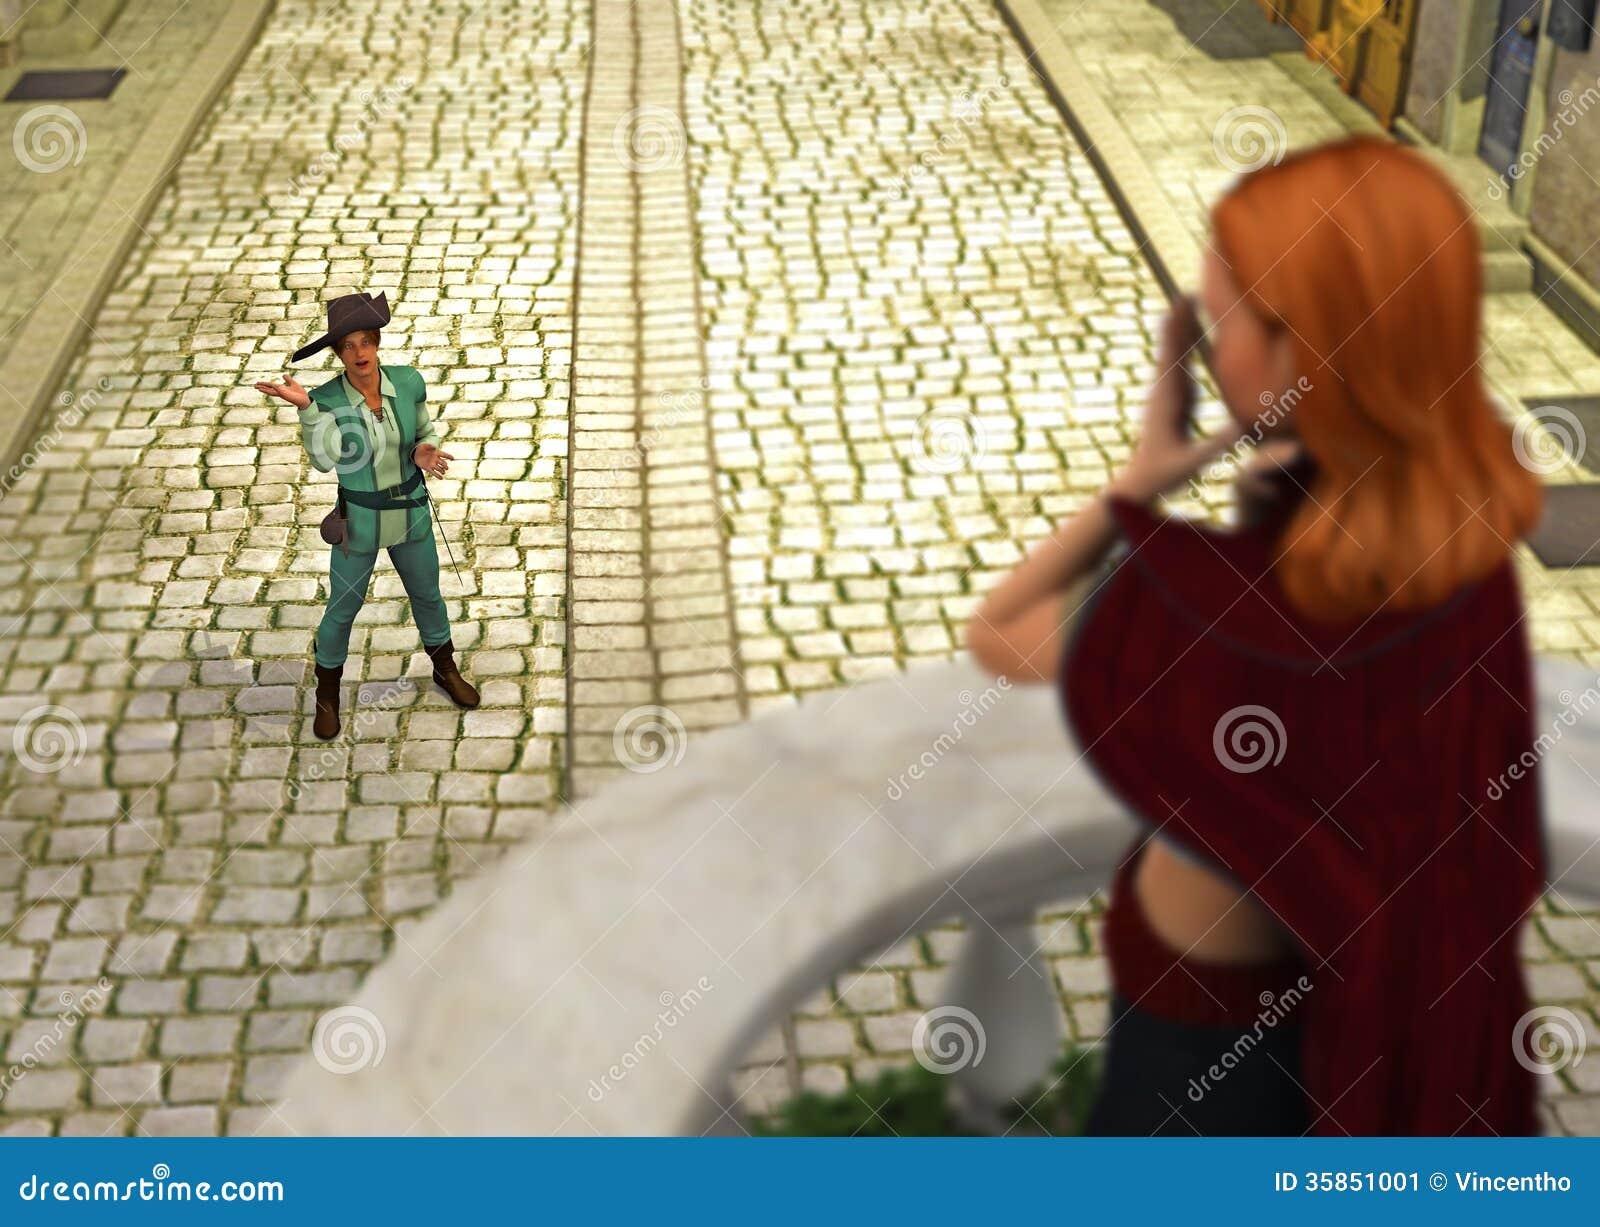 Lied-Gedicht-Prinzessin Prinz-Singing Reciting Love